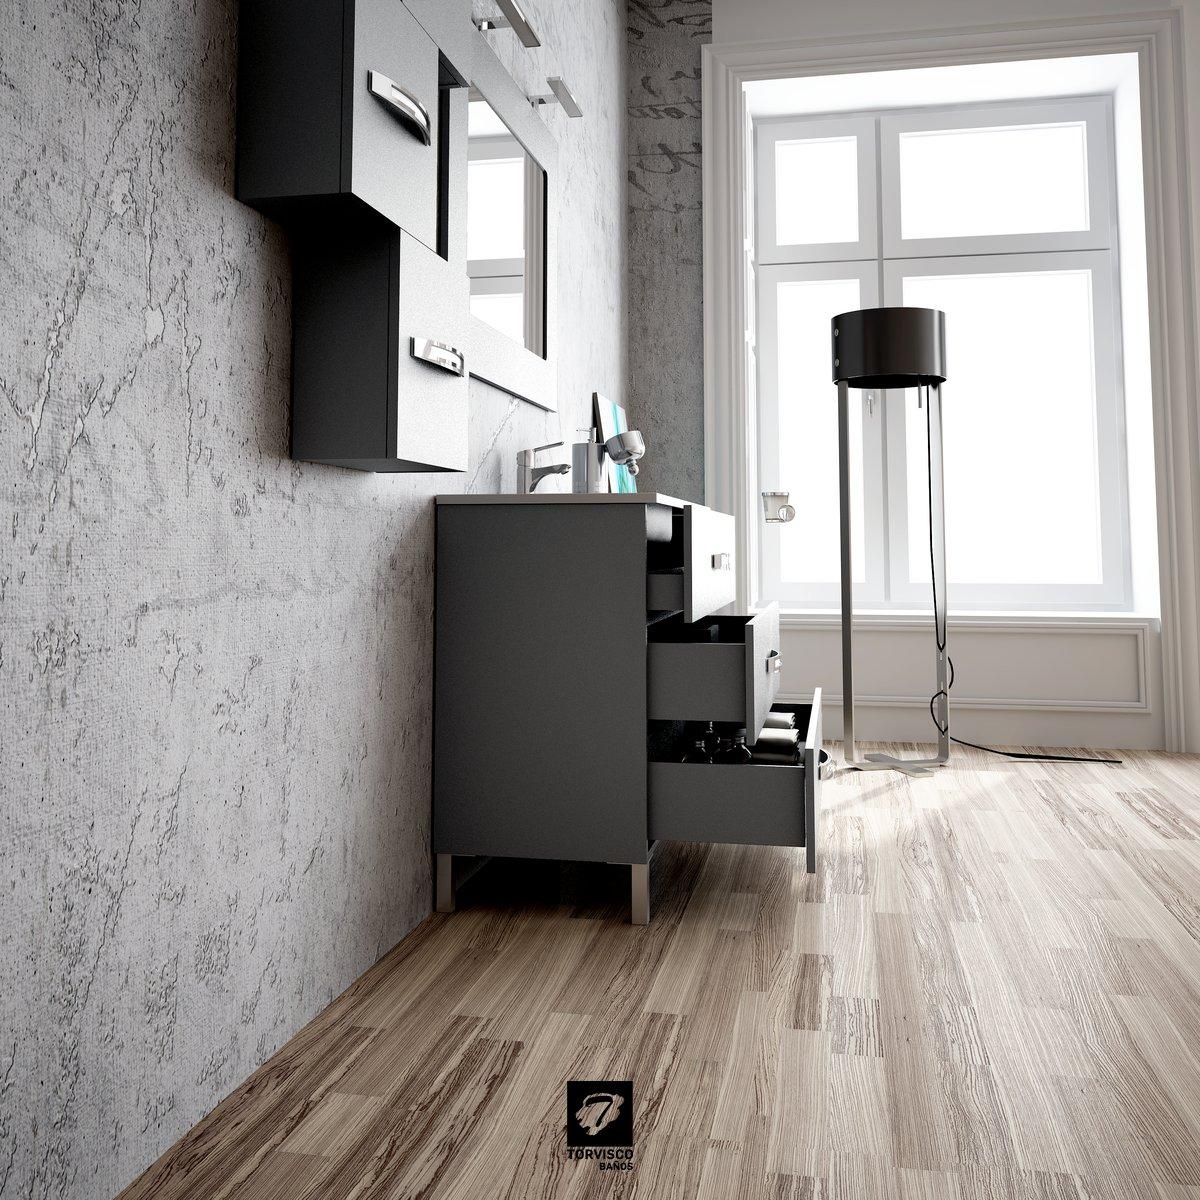 Serie garona azulejos y pavimentos mart n for Azulejos y pavimentos san juan